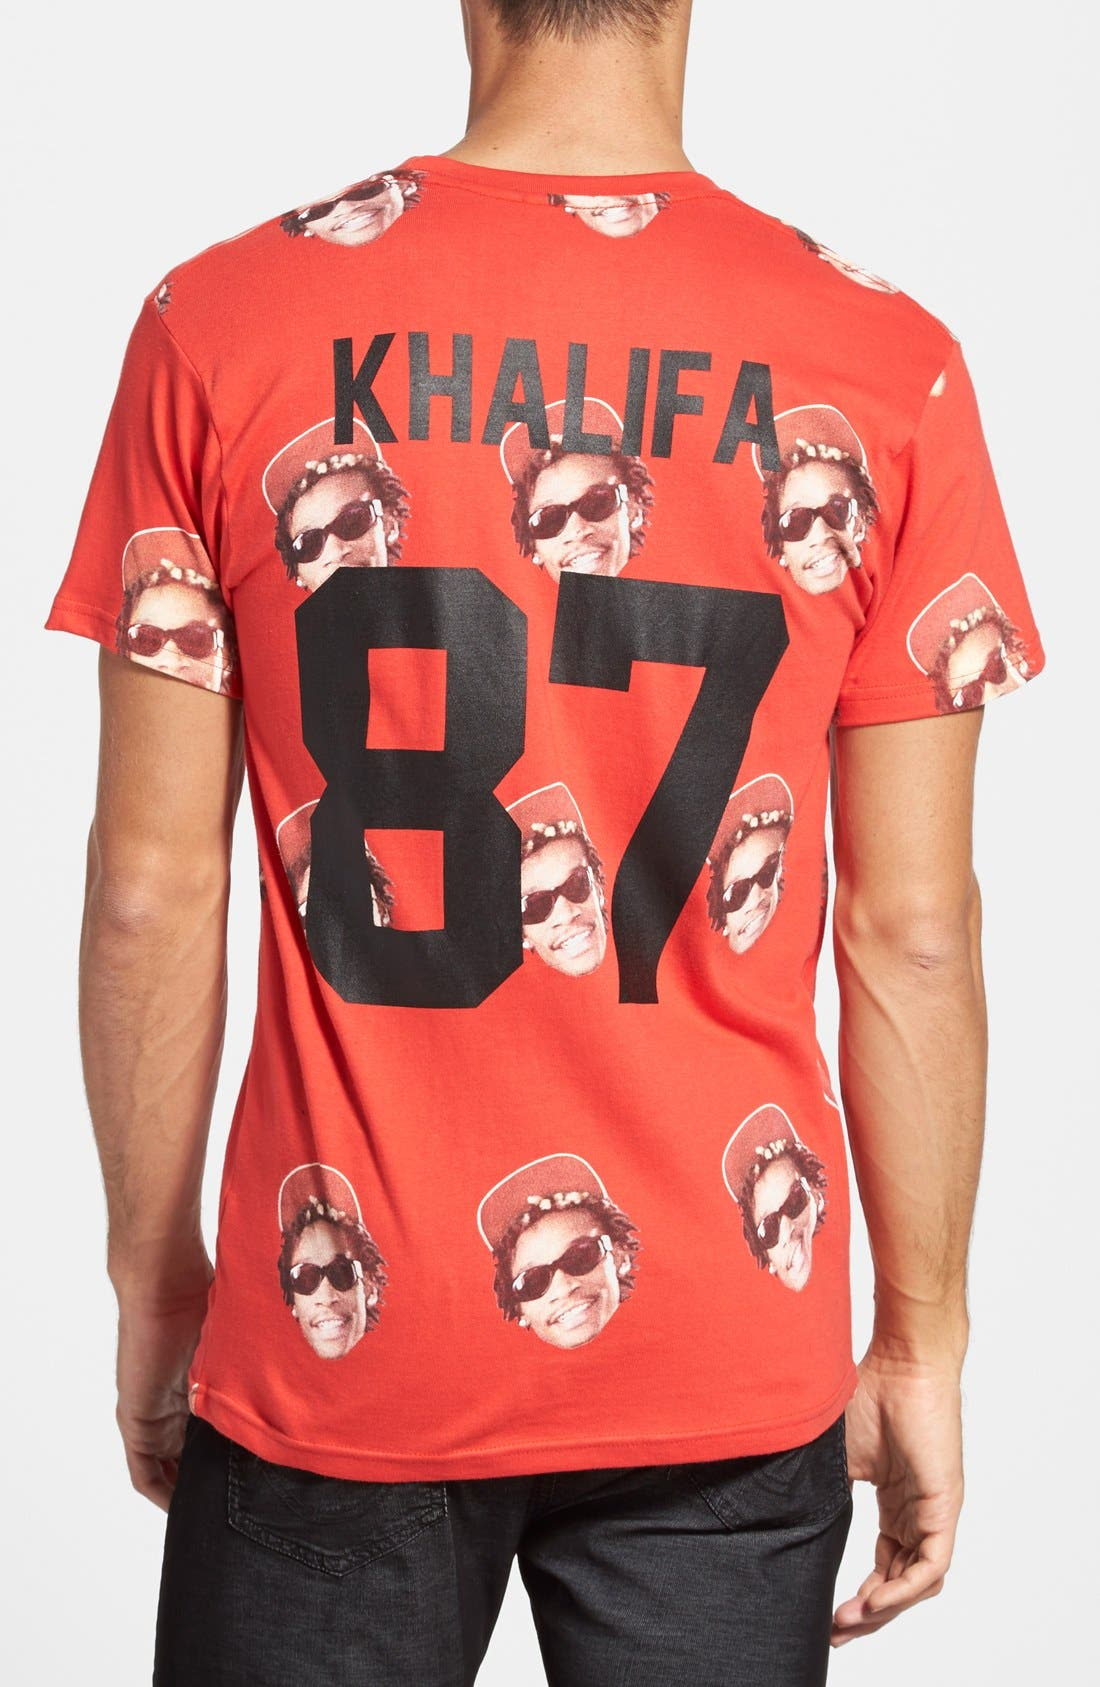 Alternate Image 1 Selected - ELEVENPARIS 'Khalifa' Paisley Print T-Shirt